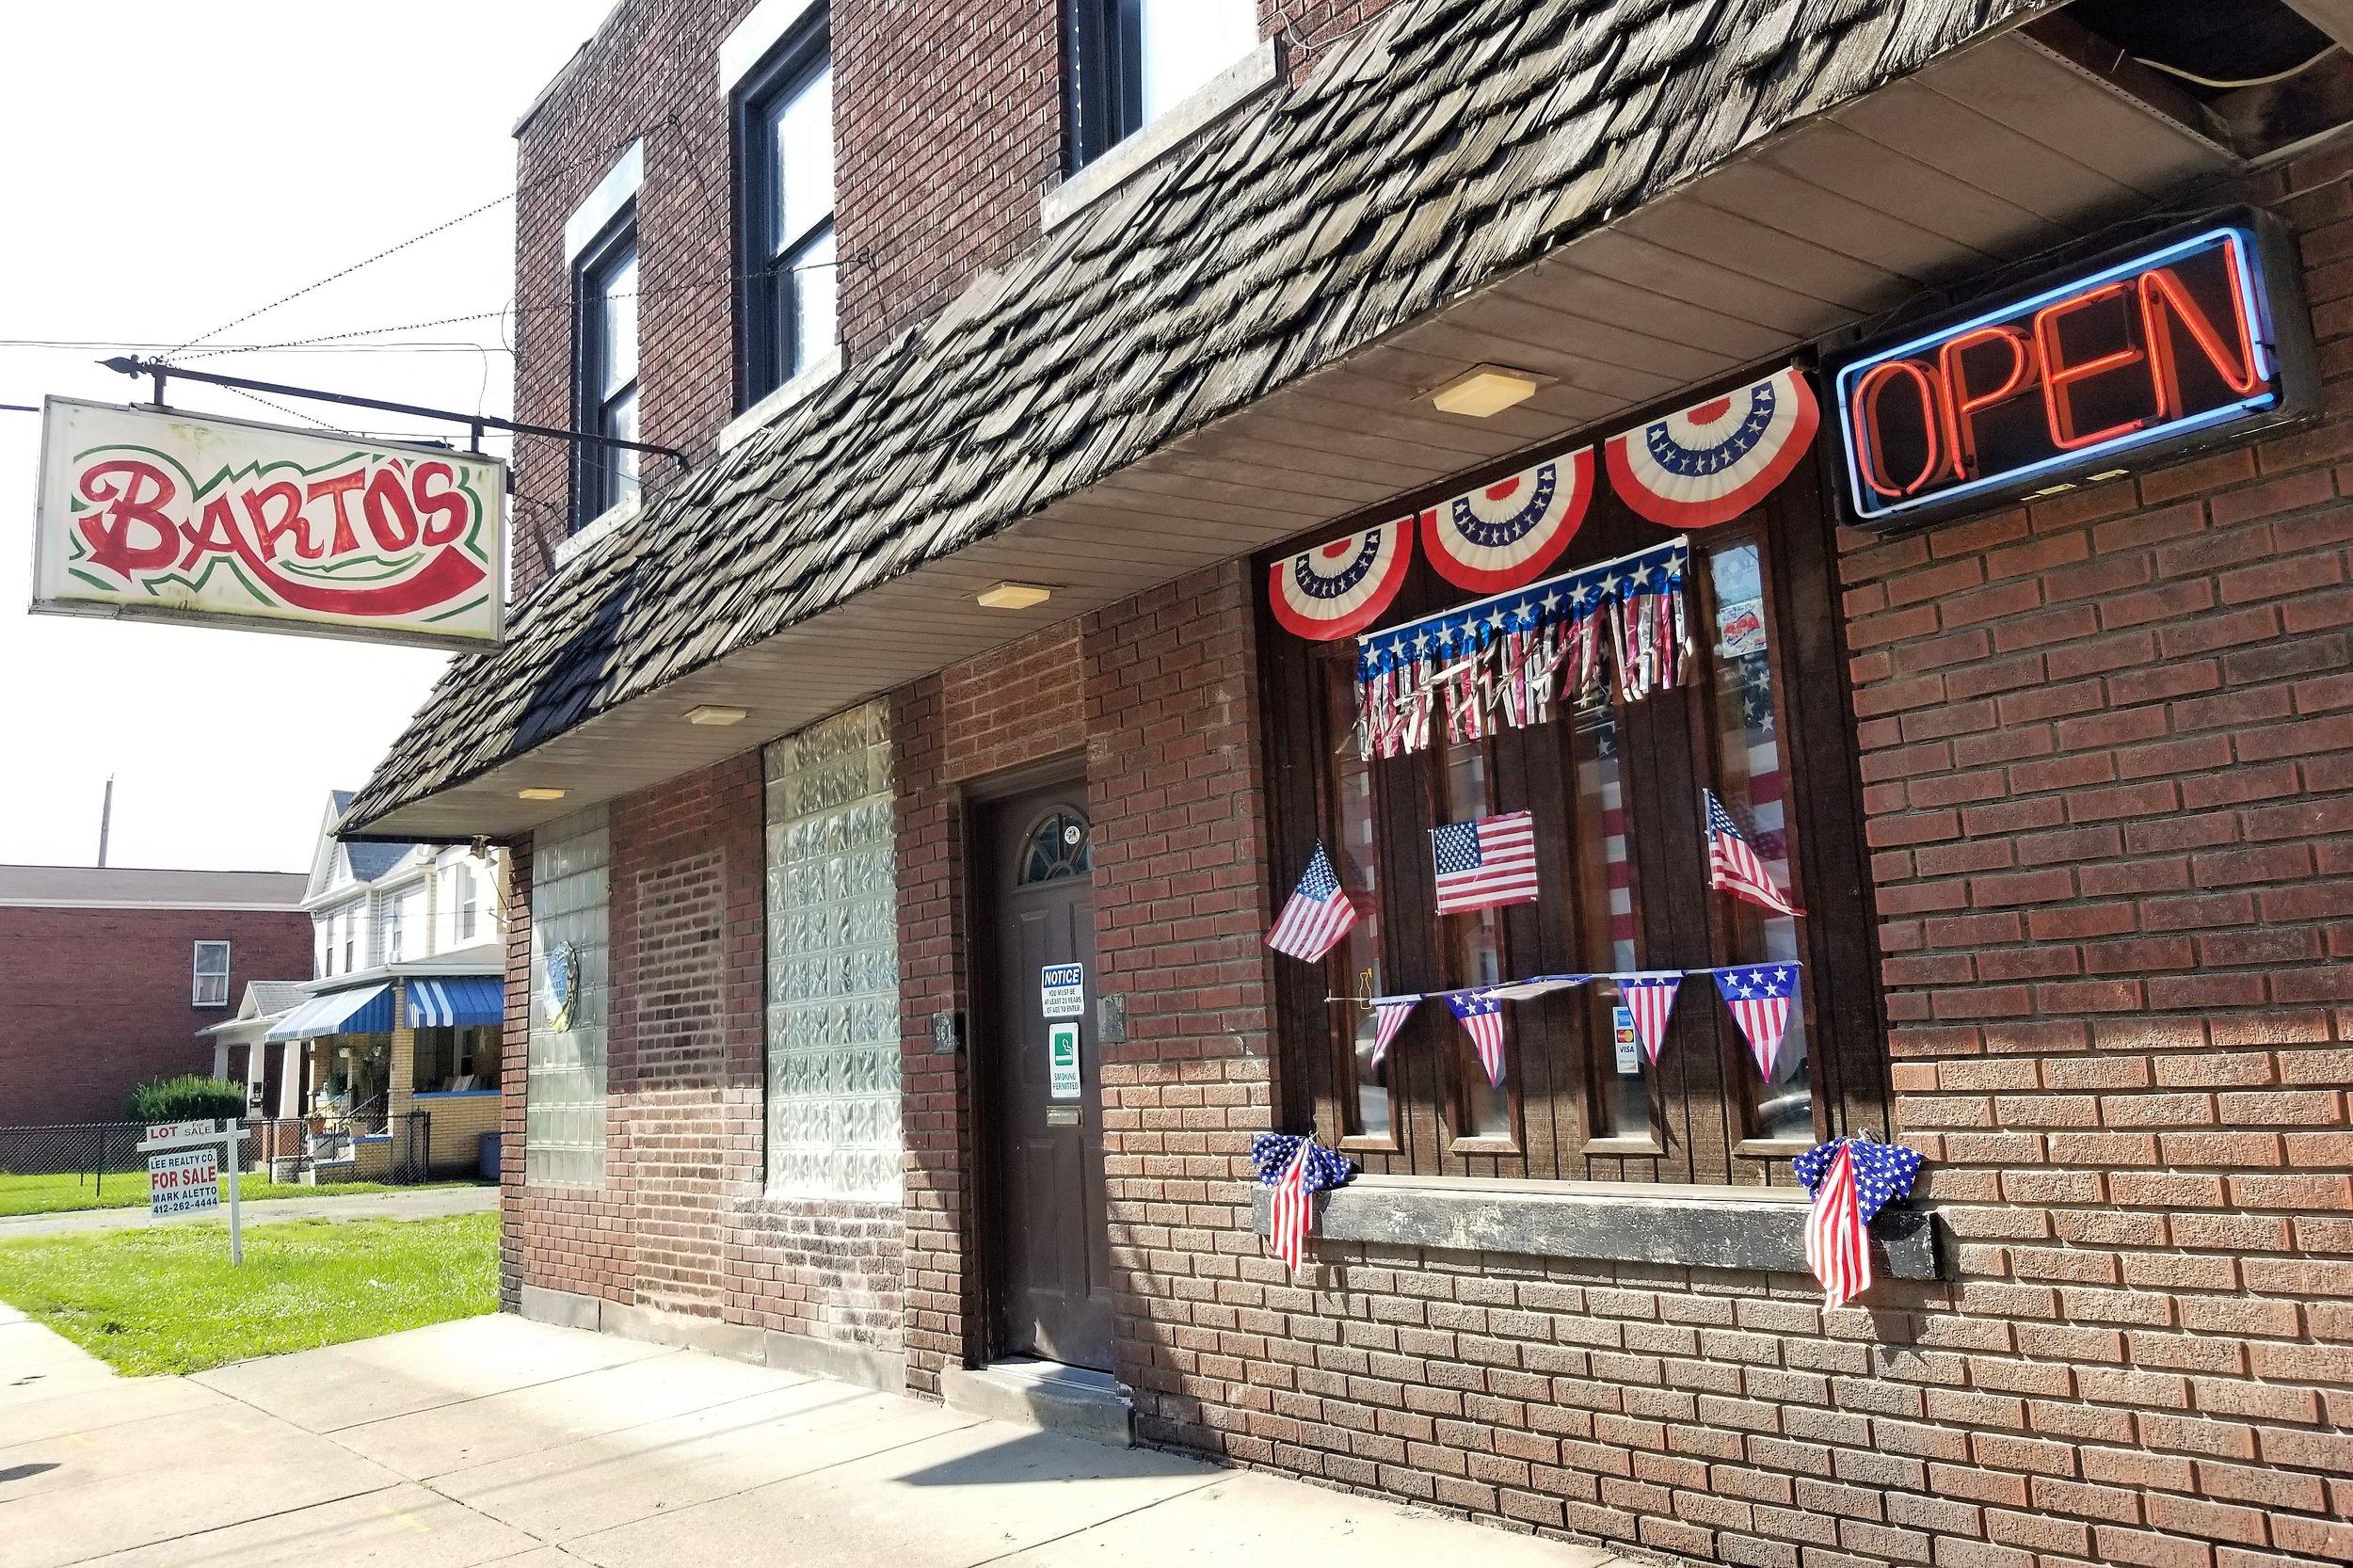 Barto's Lounge - 859 5th Ave, (412) 264-9719